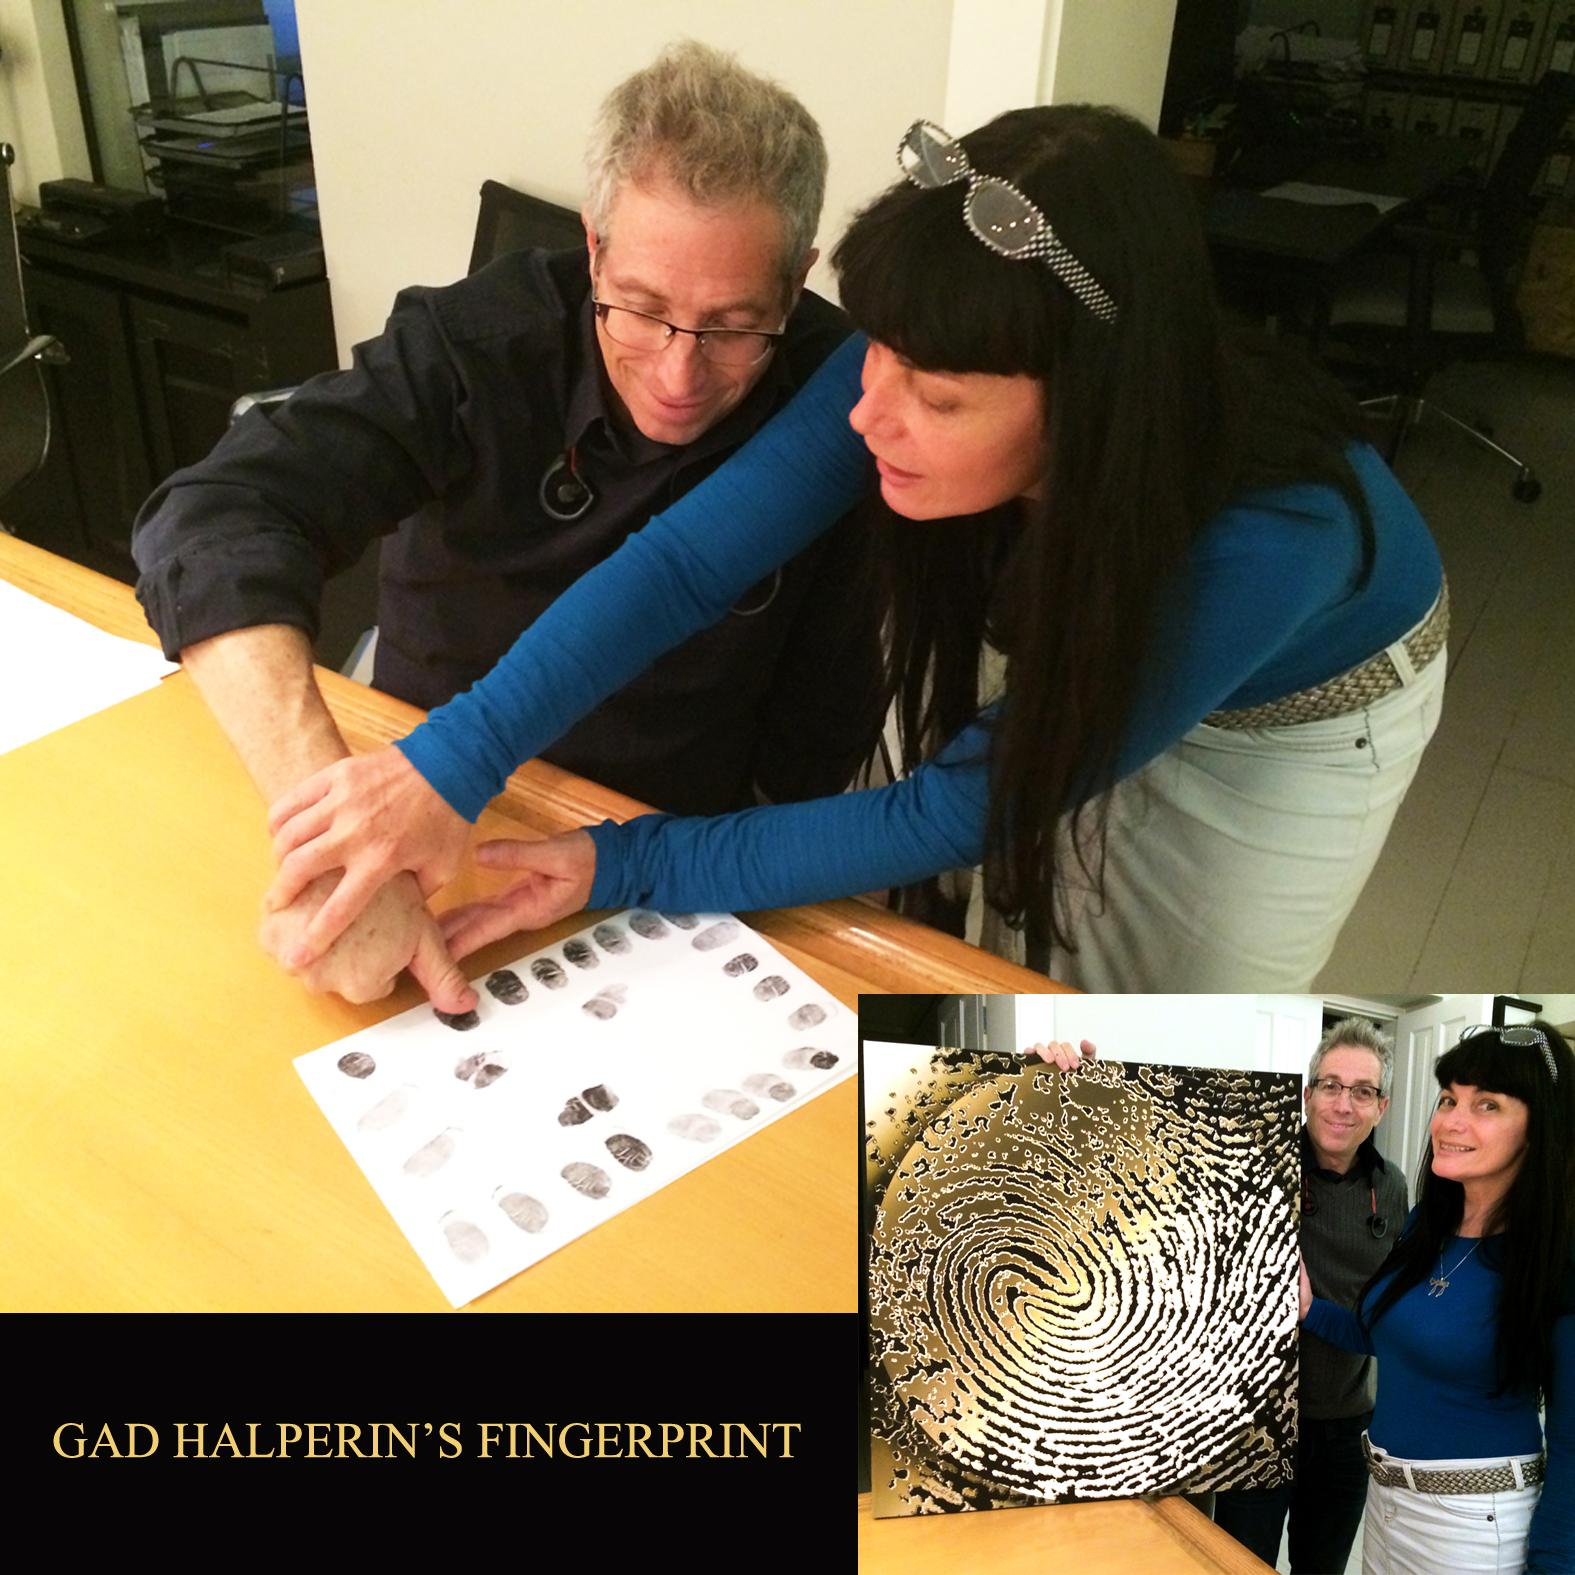 Gad Halperin's fingerprint